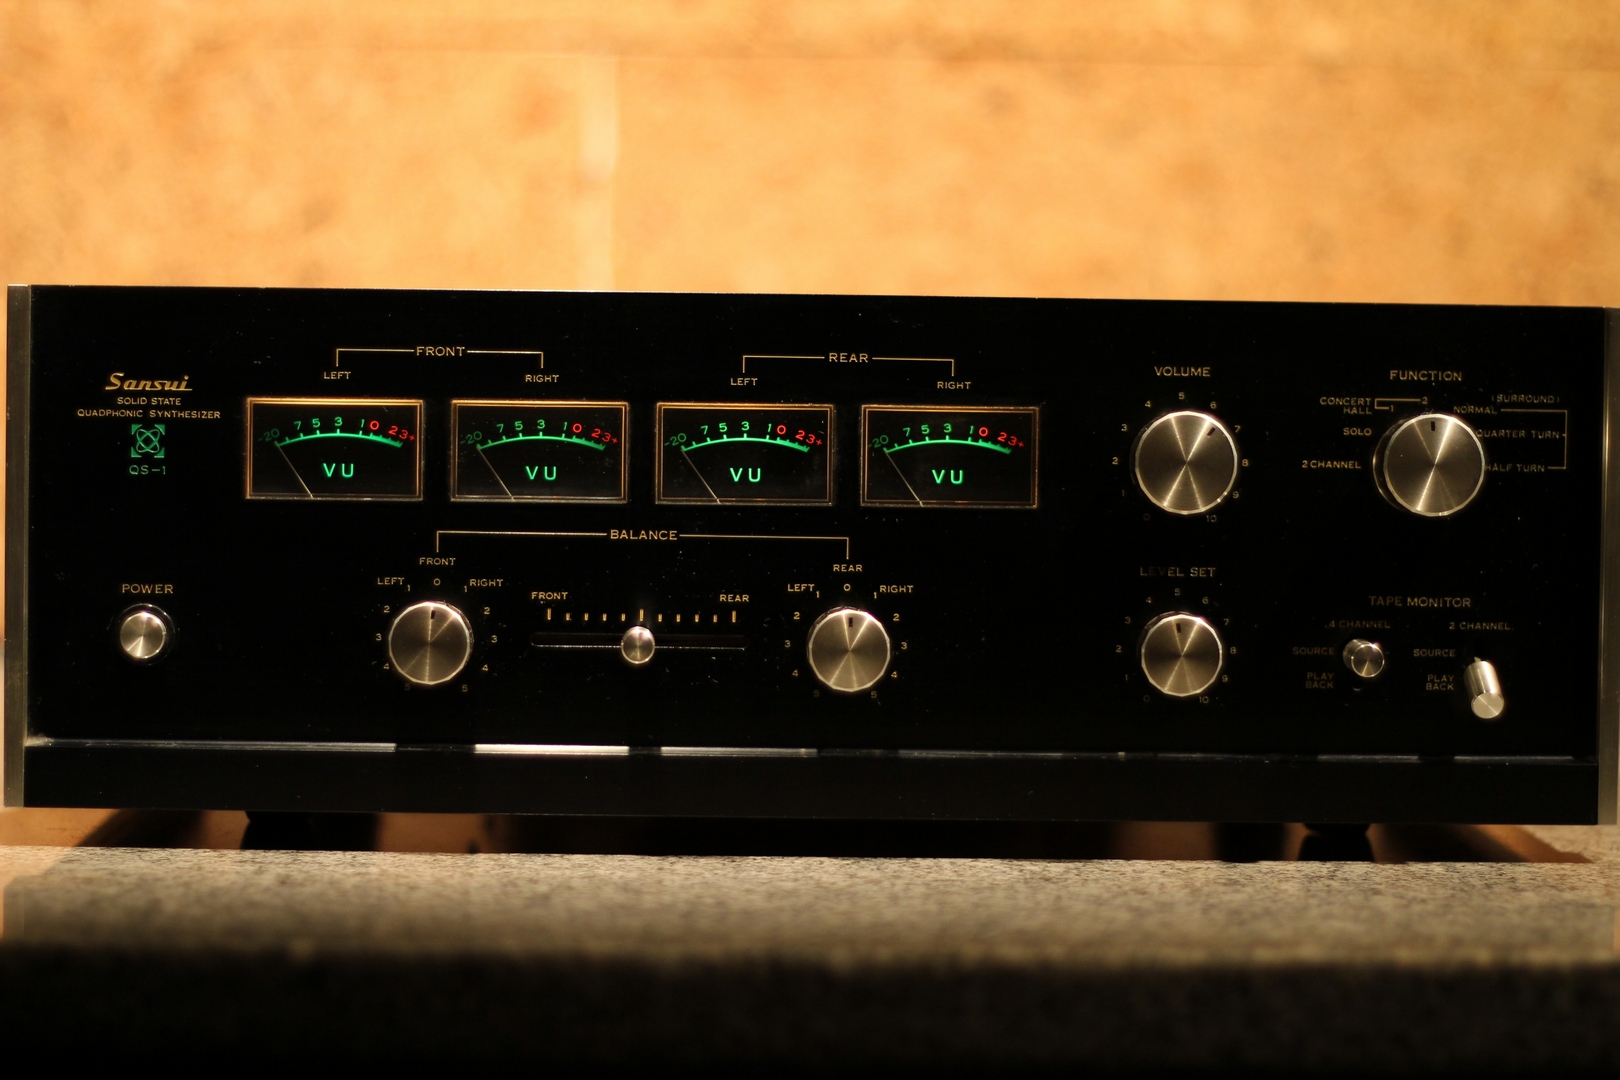 Amplificador quadrafônico Sansui modelo QS-1 (foto cedida por cortesia do Dr. Carlos Fernando Blanco).